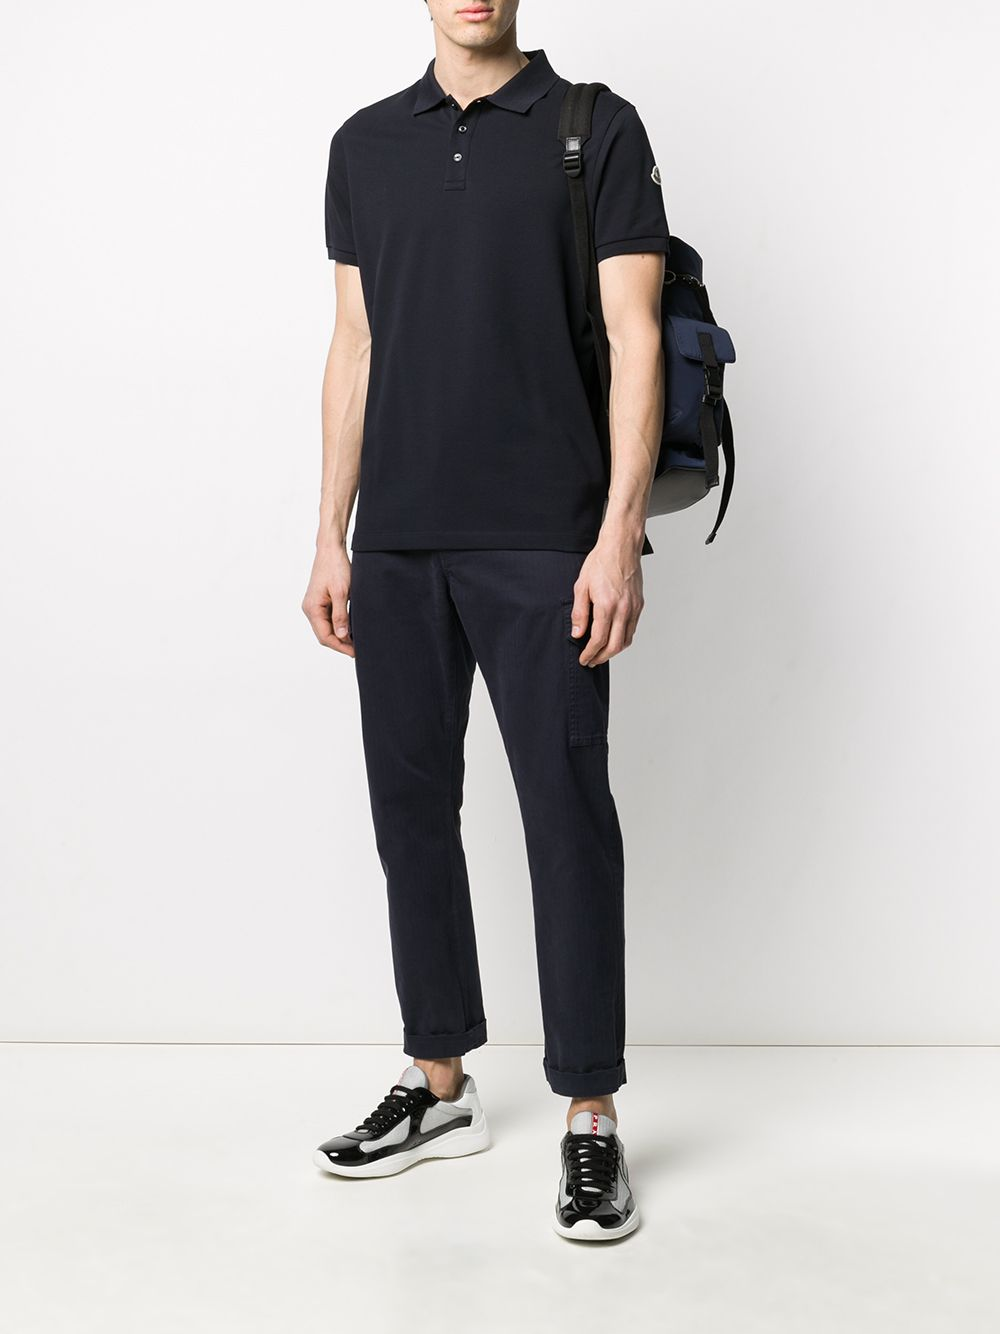 blue cotton polo shirt with side Moncler logo patch MONCLER |  | 8A705-10-84556773